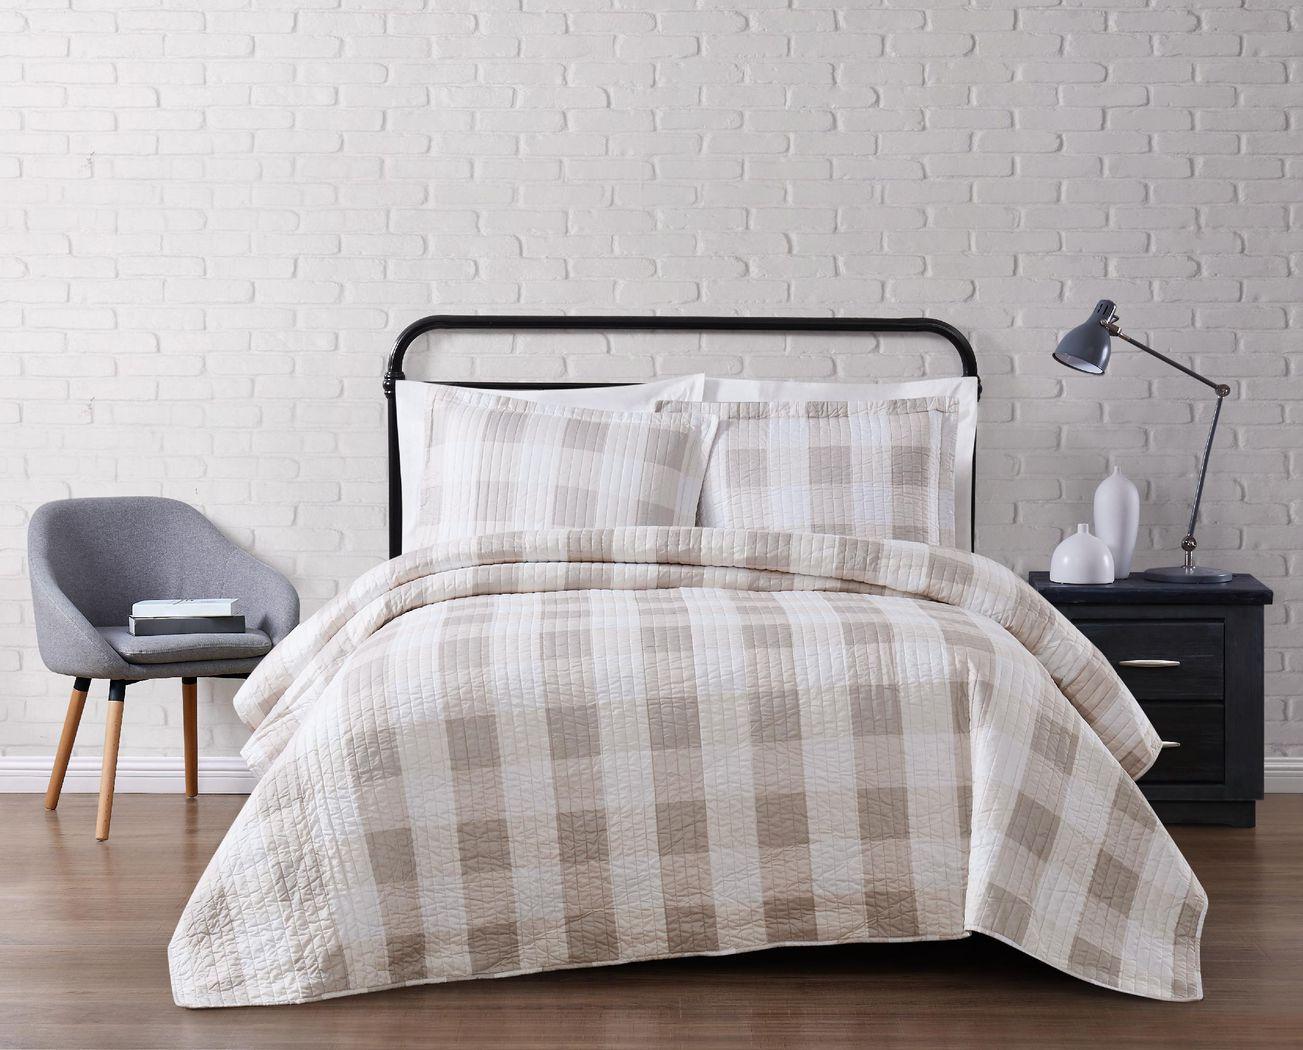 Kids Cottage Pearl Khaki 3 Pc Full/Queen Comforter Set